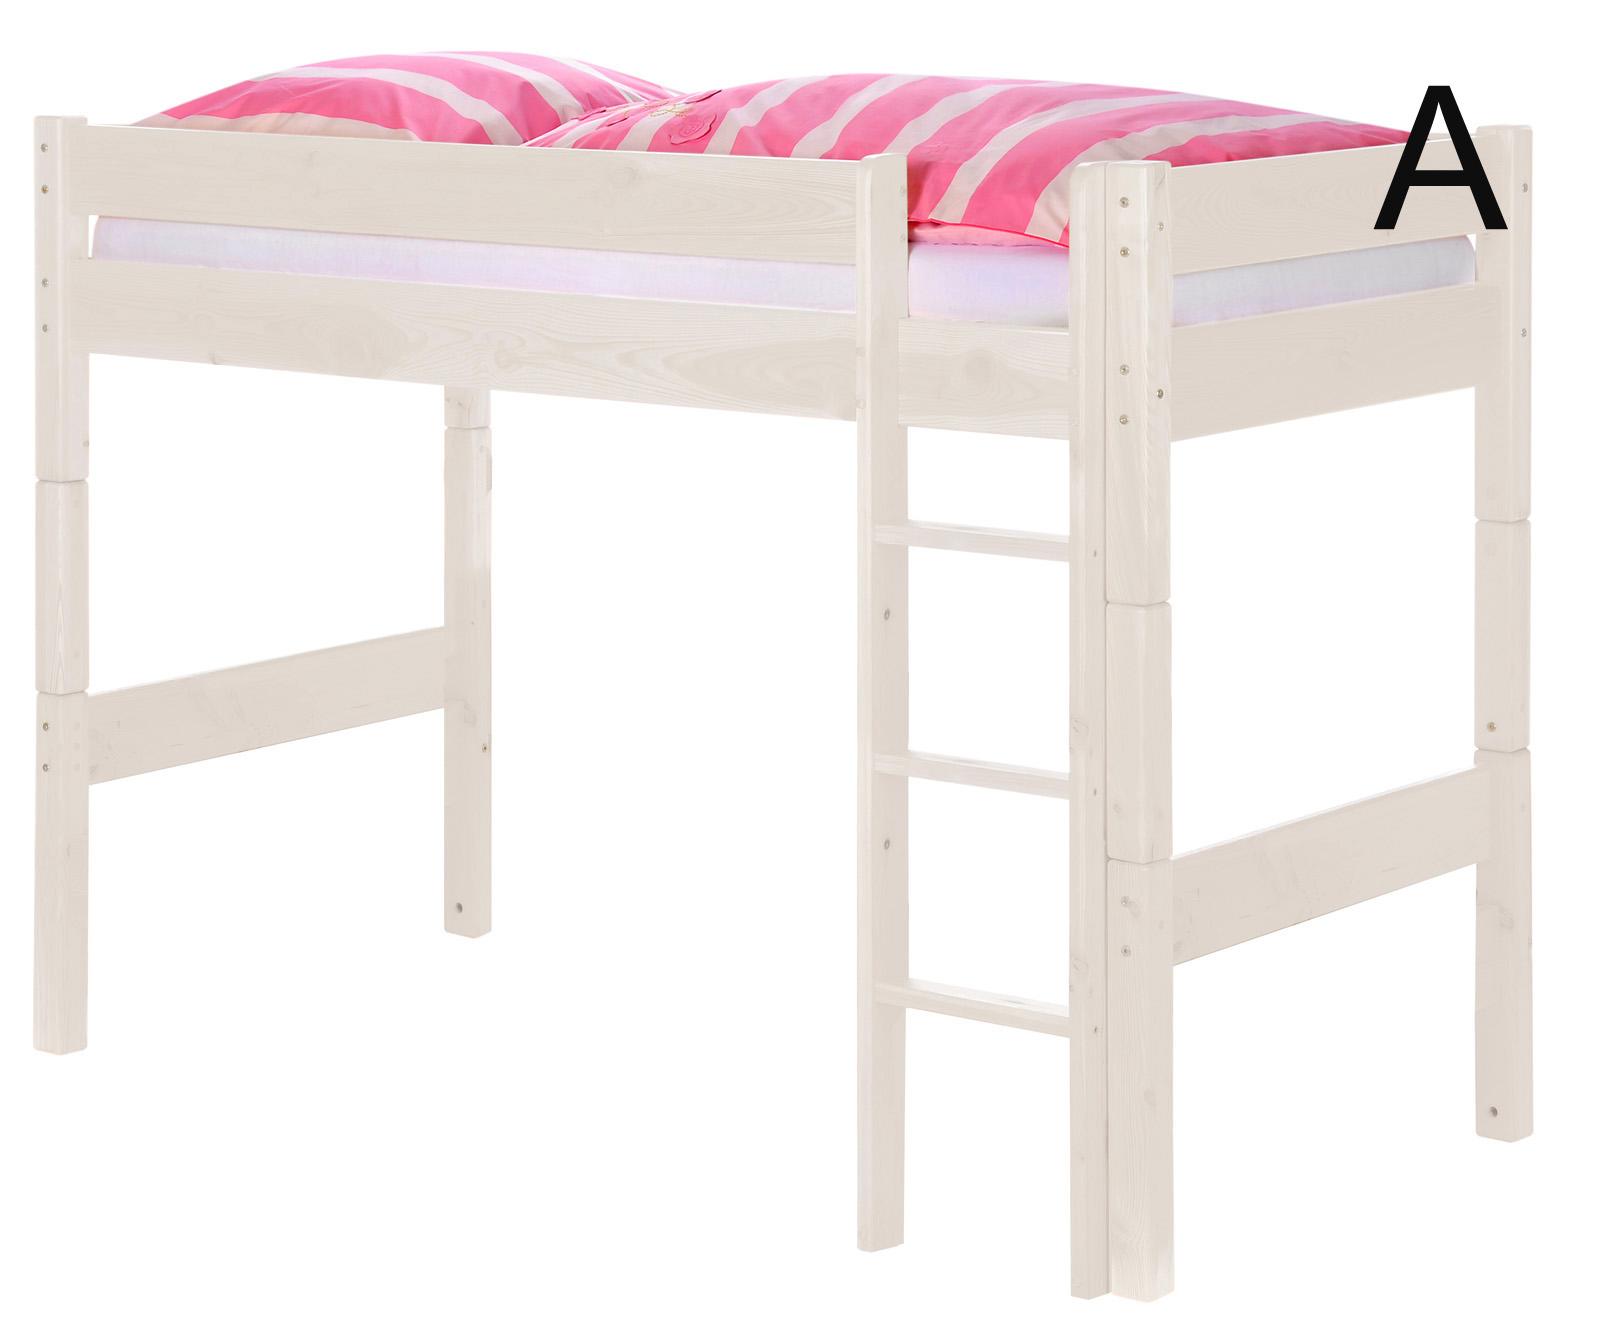 sam kinder hochbett wei optional massiv buche wolke7. Black Bedroom Furniture Sets. Home Design Ideas